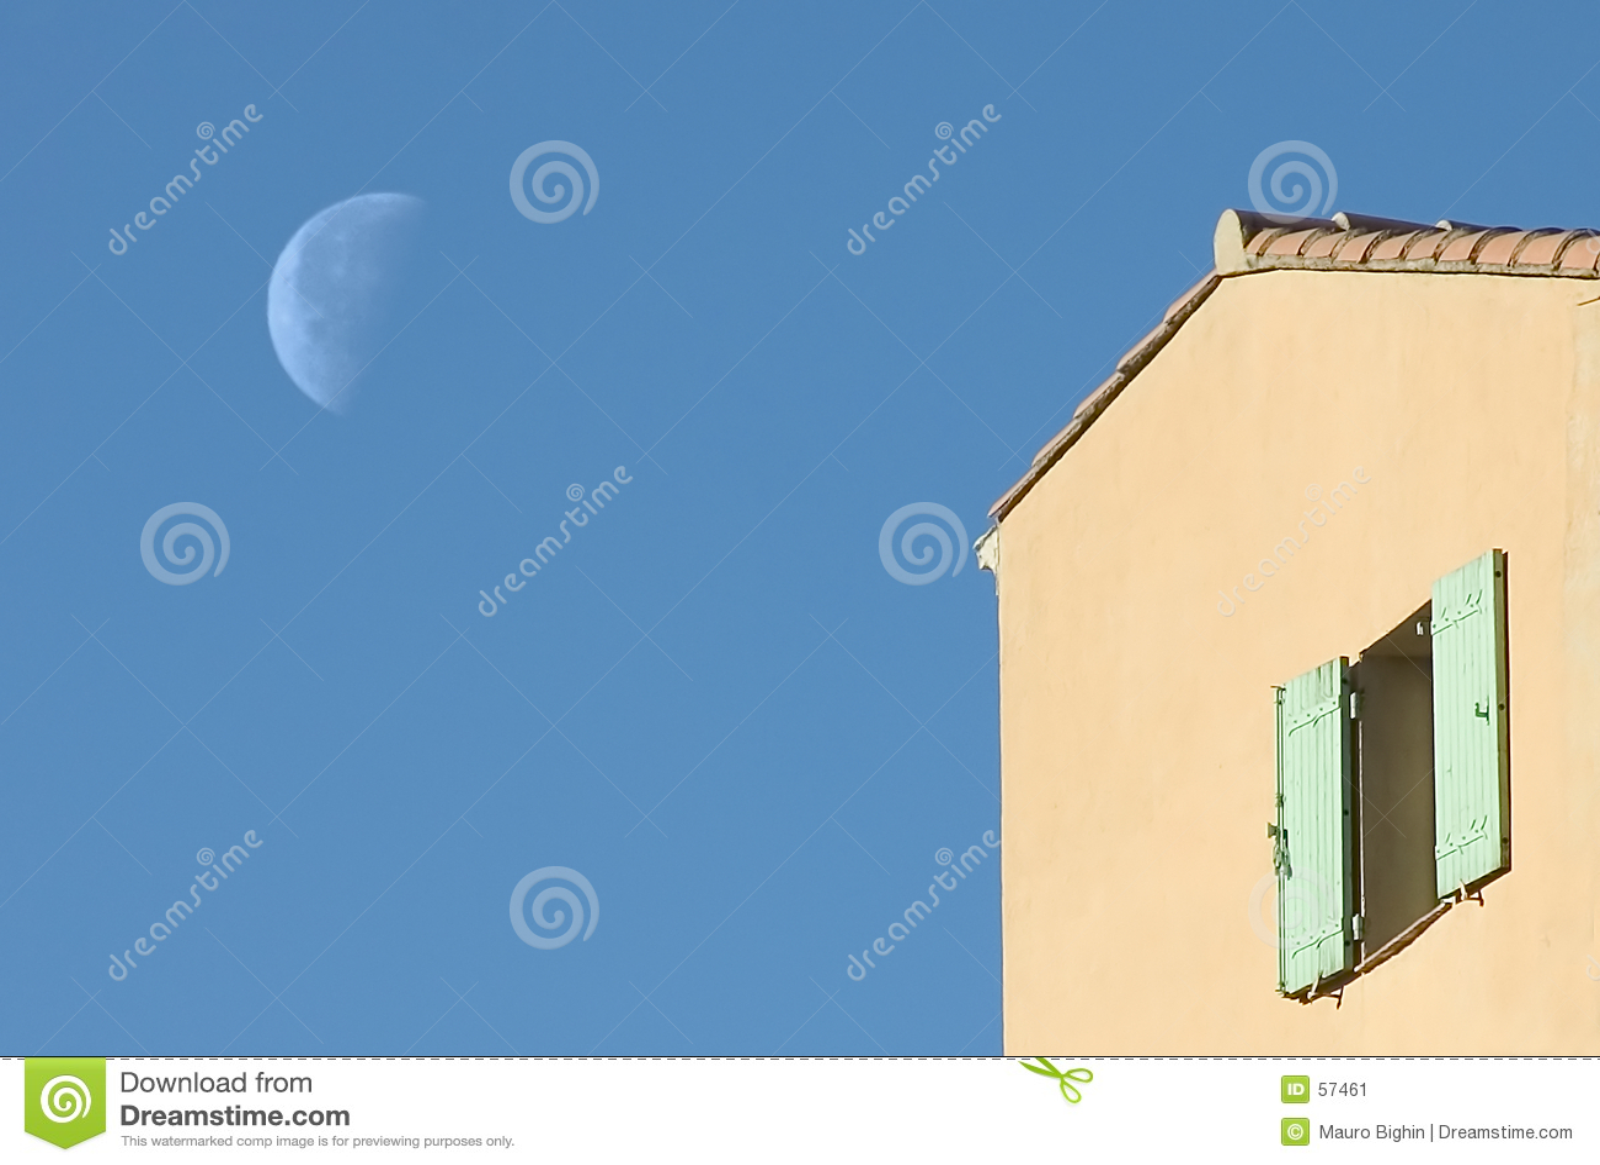 Moon provence